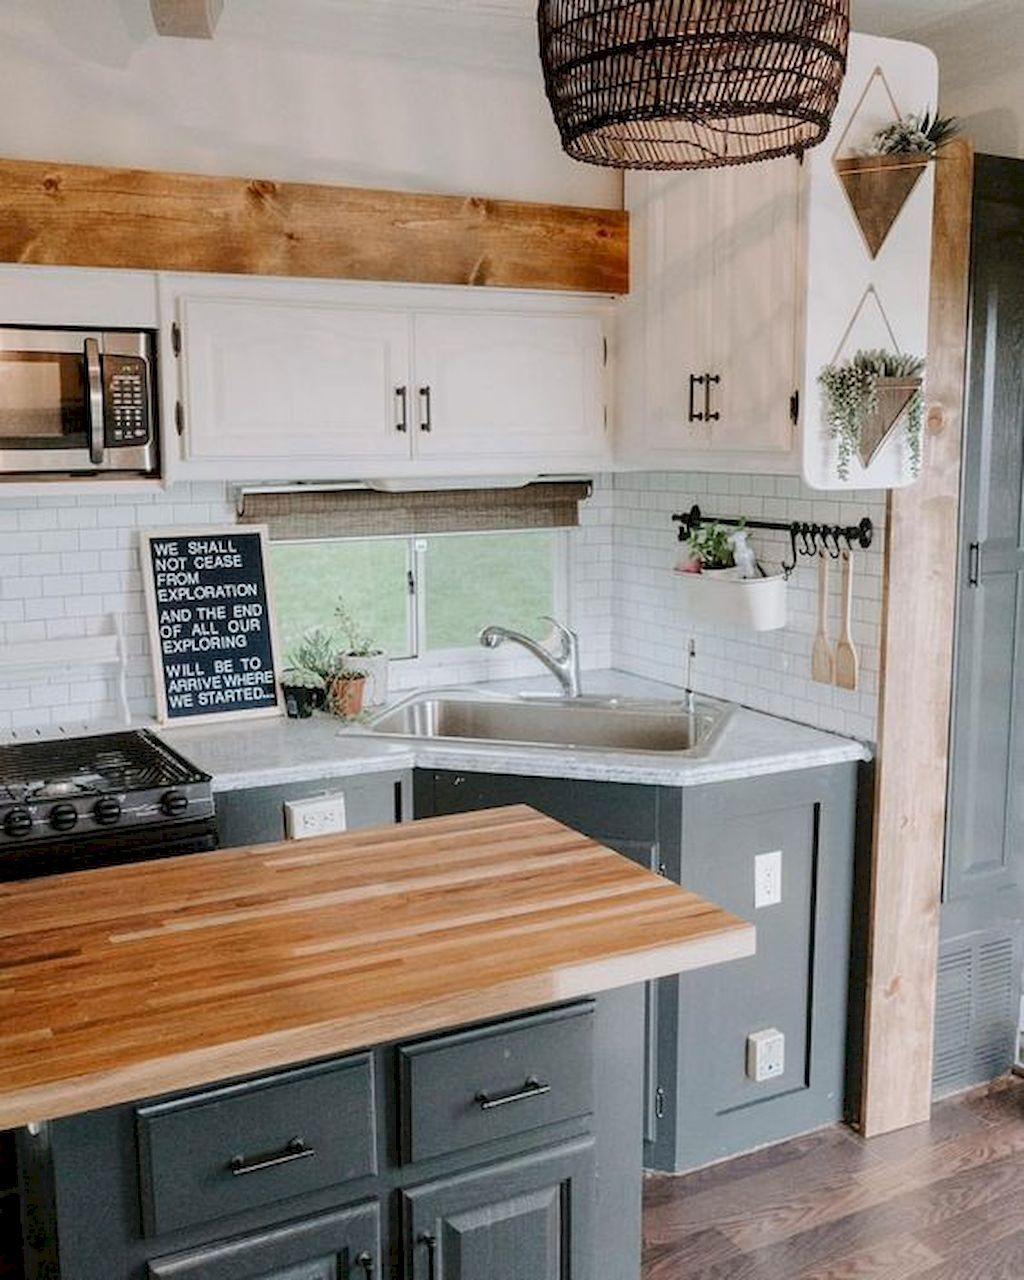 37 Stunning And Simple Rvs Camper Storage Remodel Ideas Kitchen Renovation Kitchen Remodel Remodeled Campers